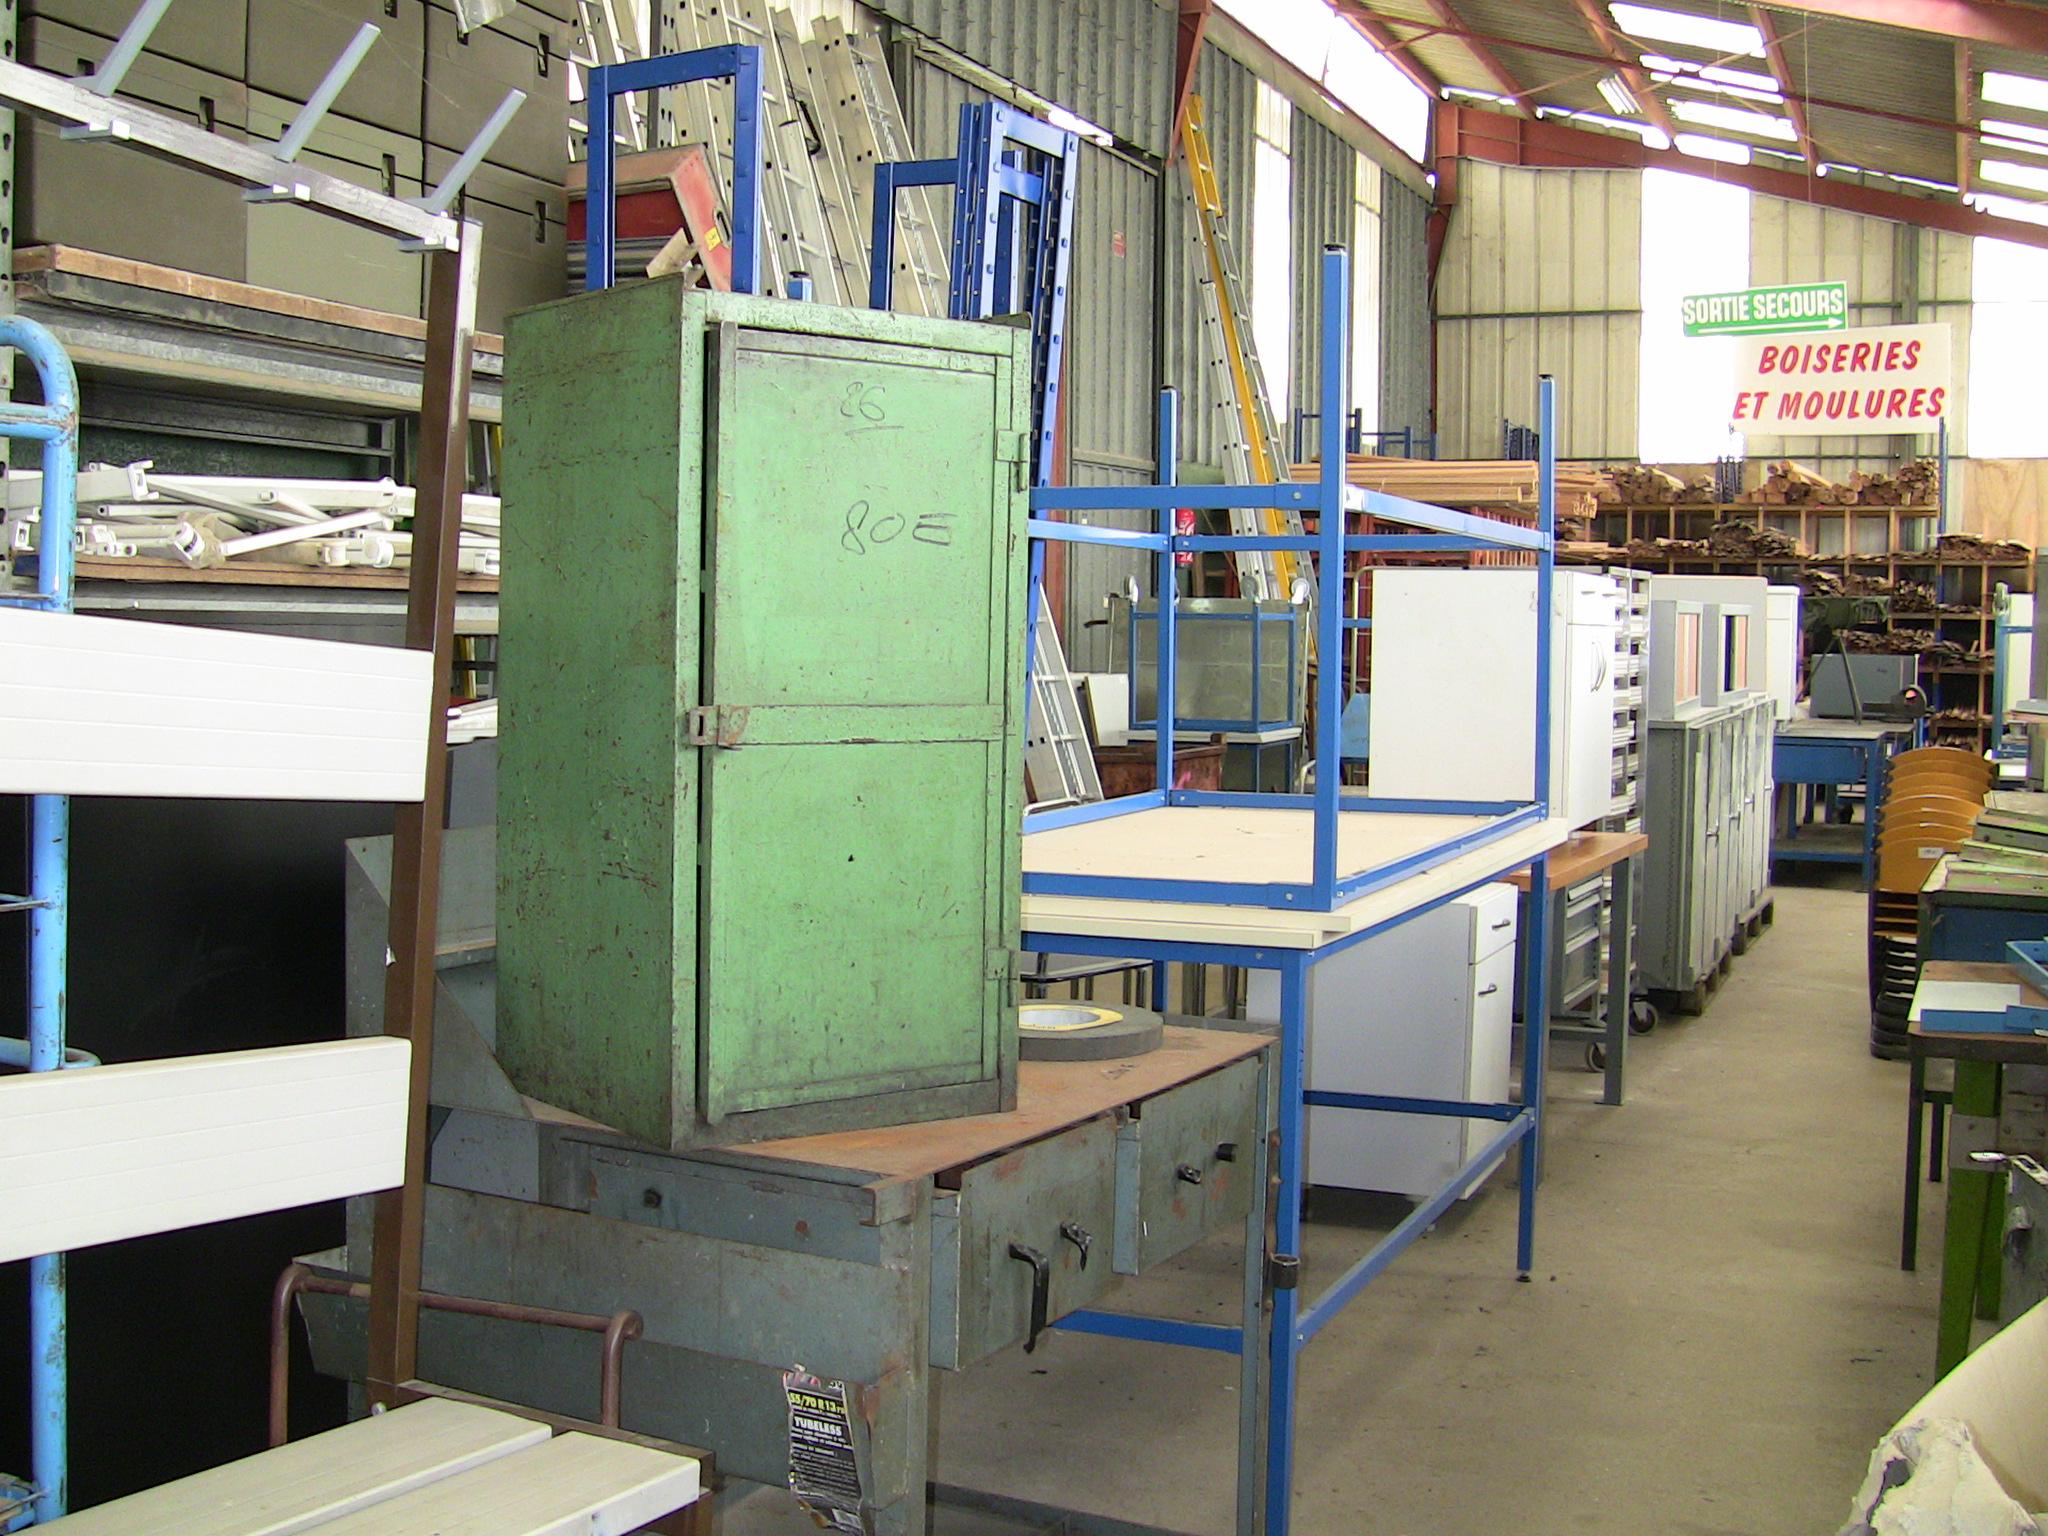 Bgf 61 brocante industrielle de glos la ferri re mobilier industriel - La brocante industrielle ...